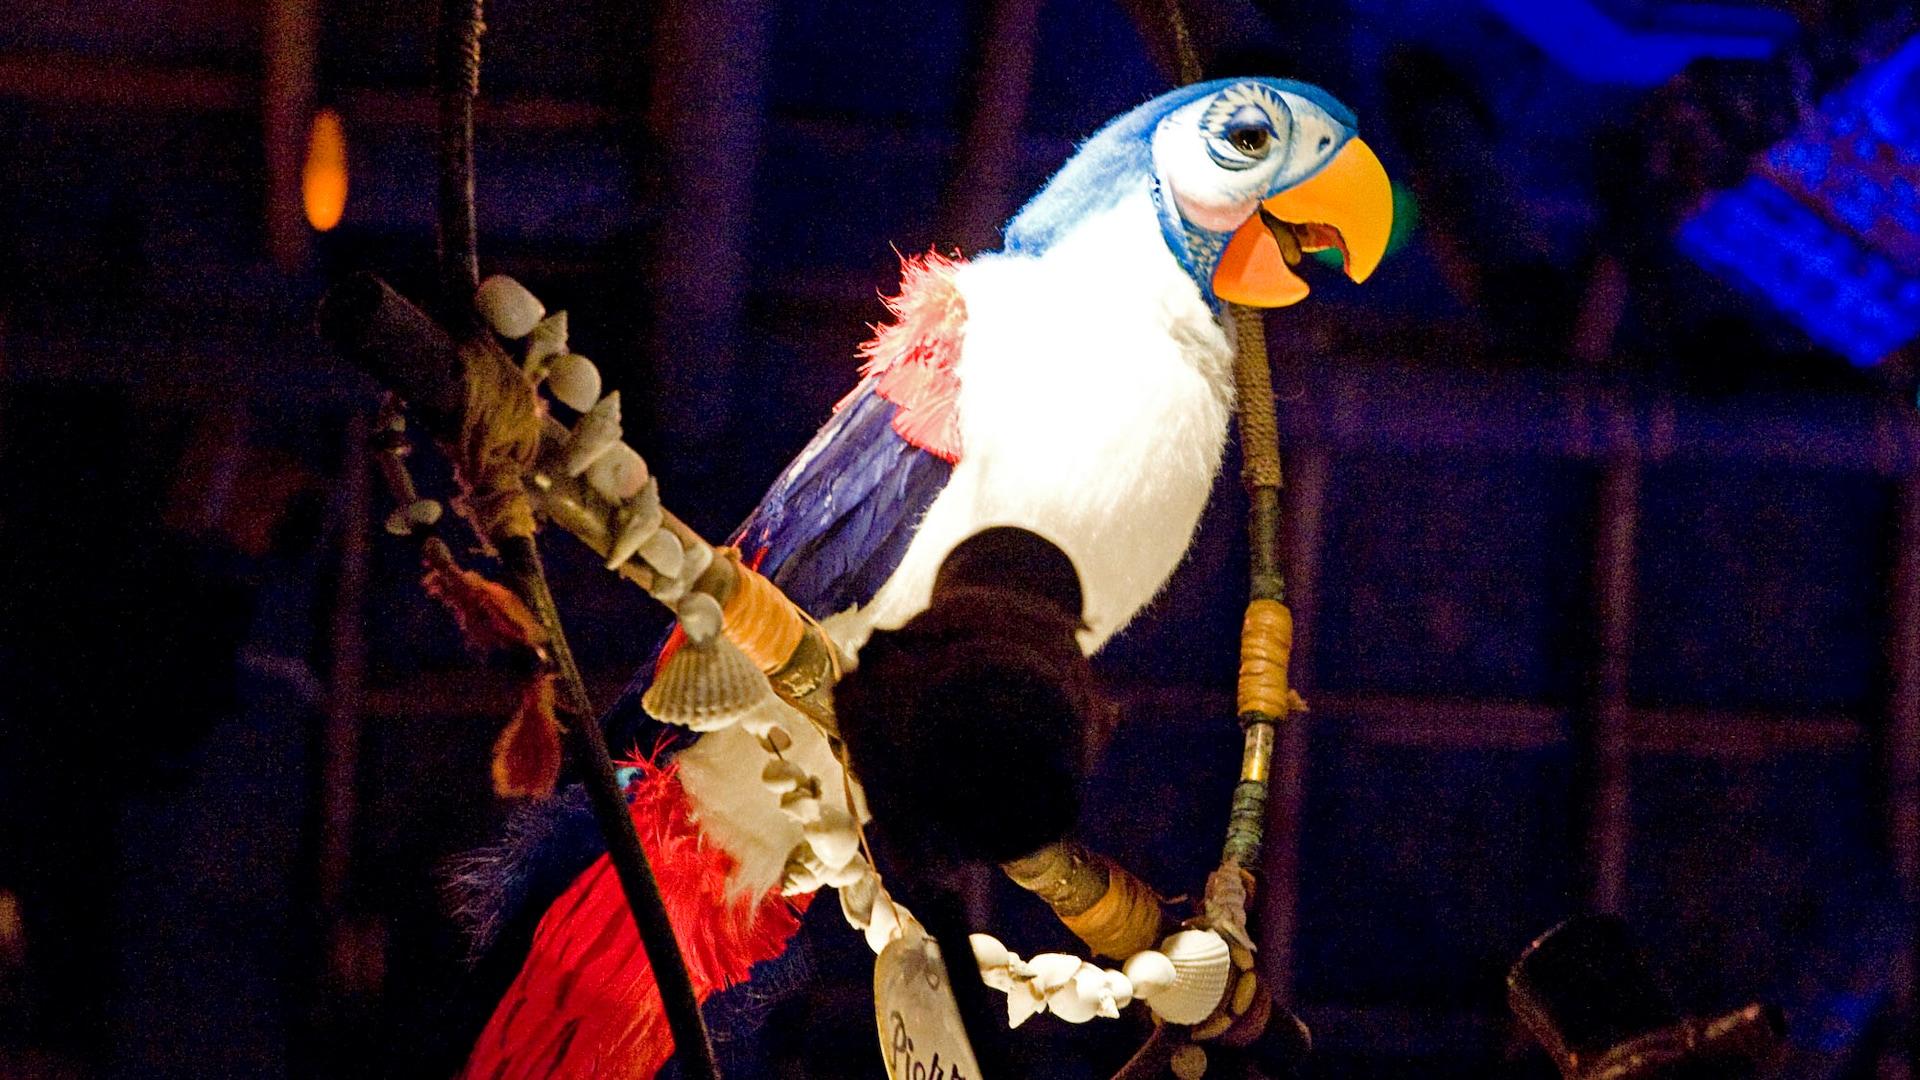 Underrated rides at Disneyland- Walt Disney's Enchanted Tiki Room